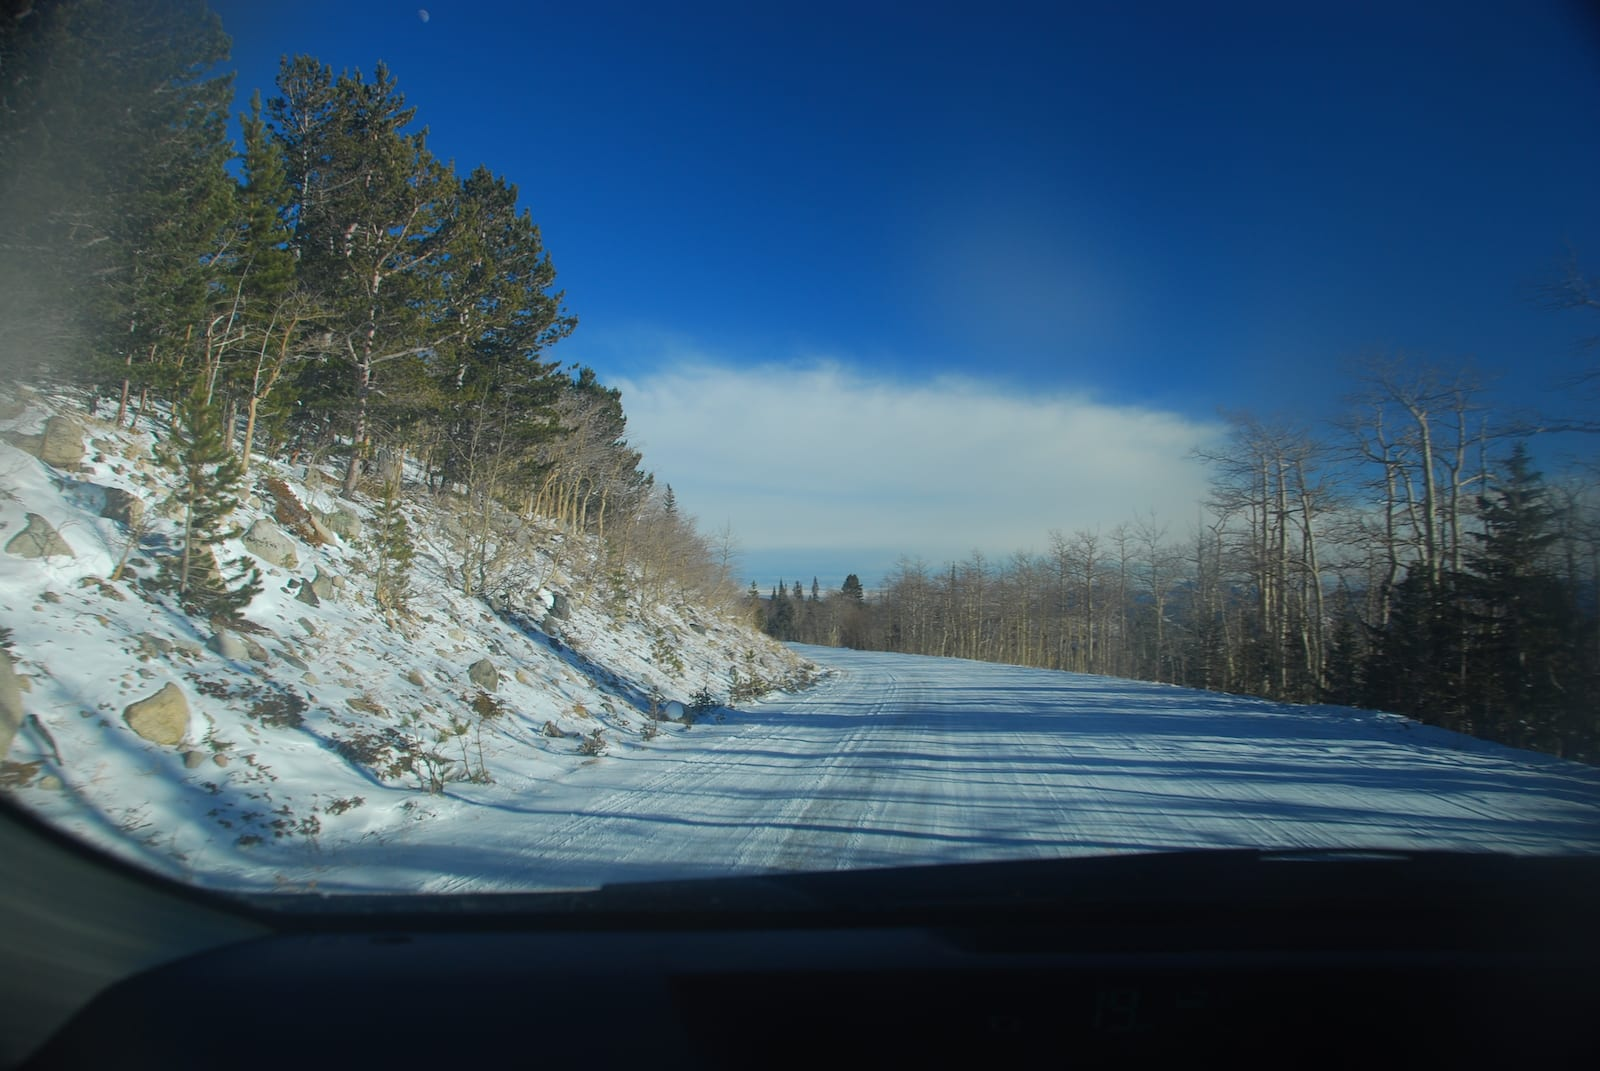 Snowy Road to Brainard Lake, CO